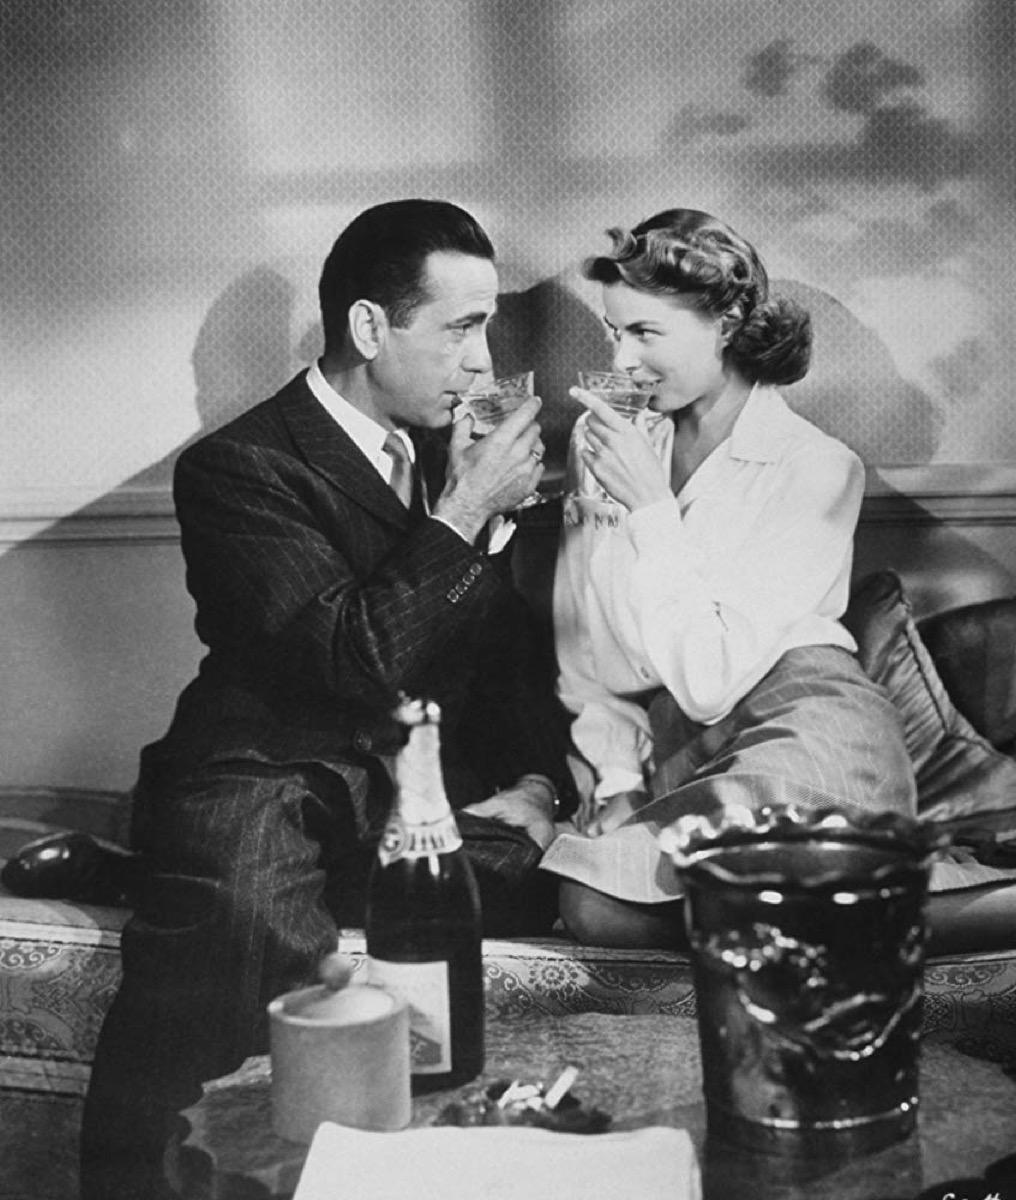 Ingrid Bergman and Humphrey Bogart sharing a drink in Casablanca